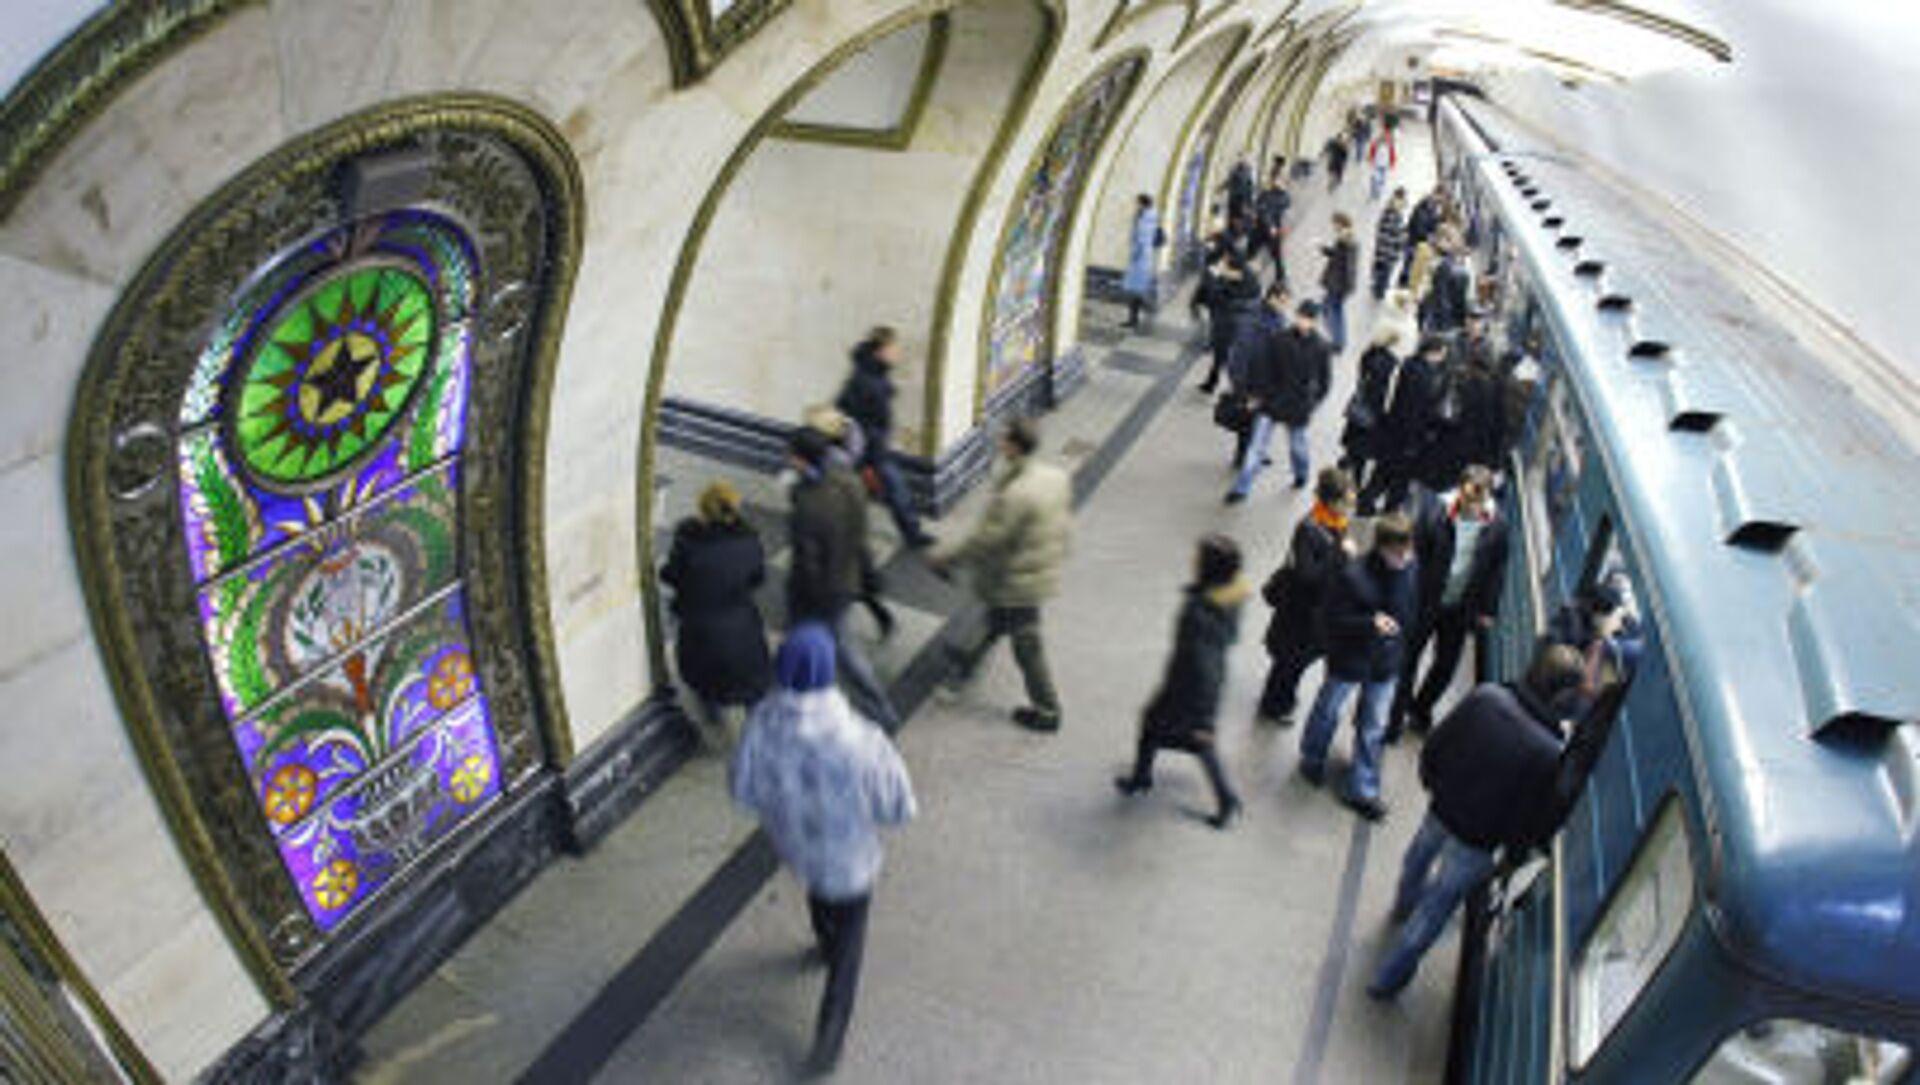 Mosca, la stazione della Metro Novoslobodskaya - Sputnik Italia, 1920, 15.05.2021